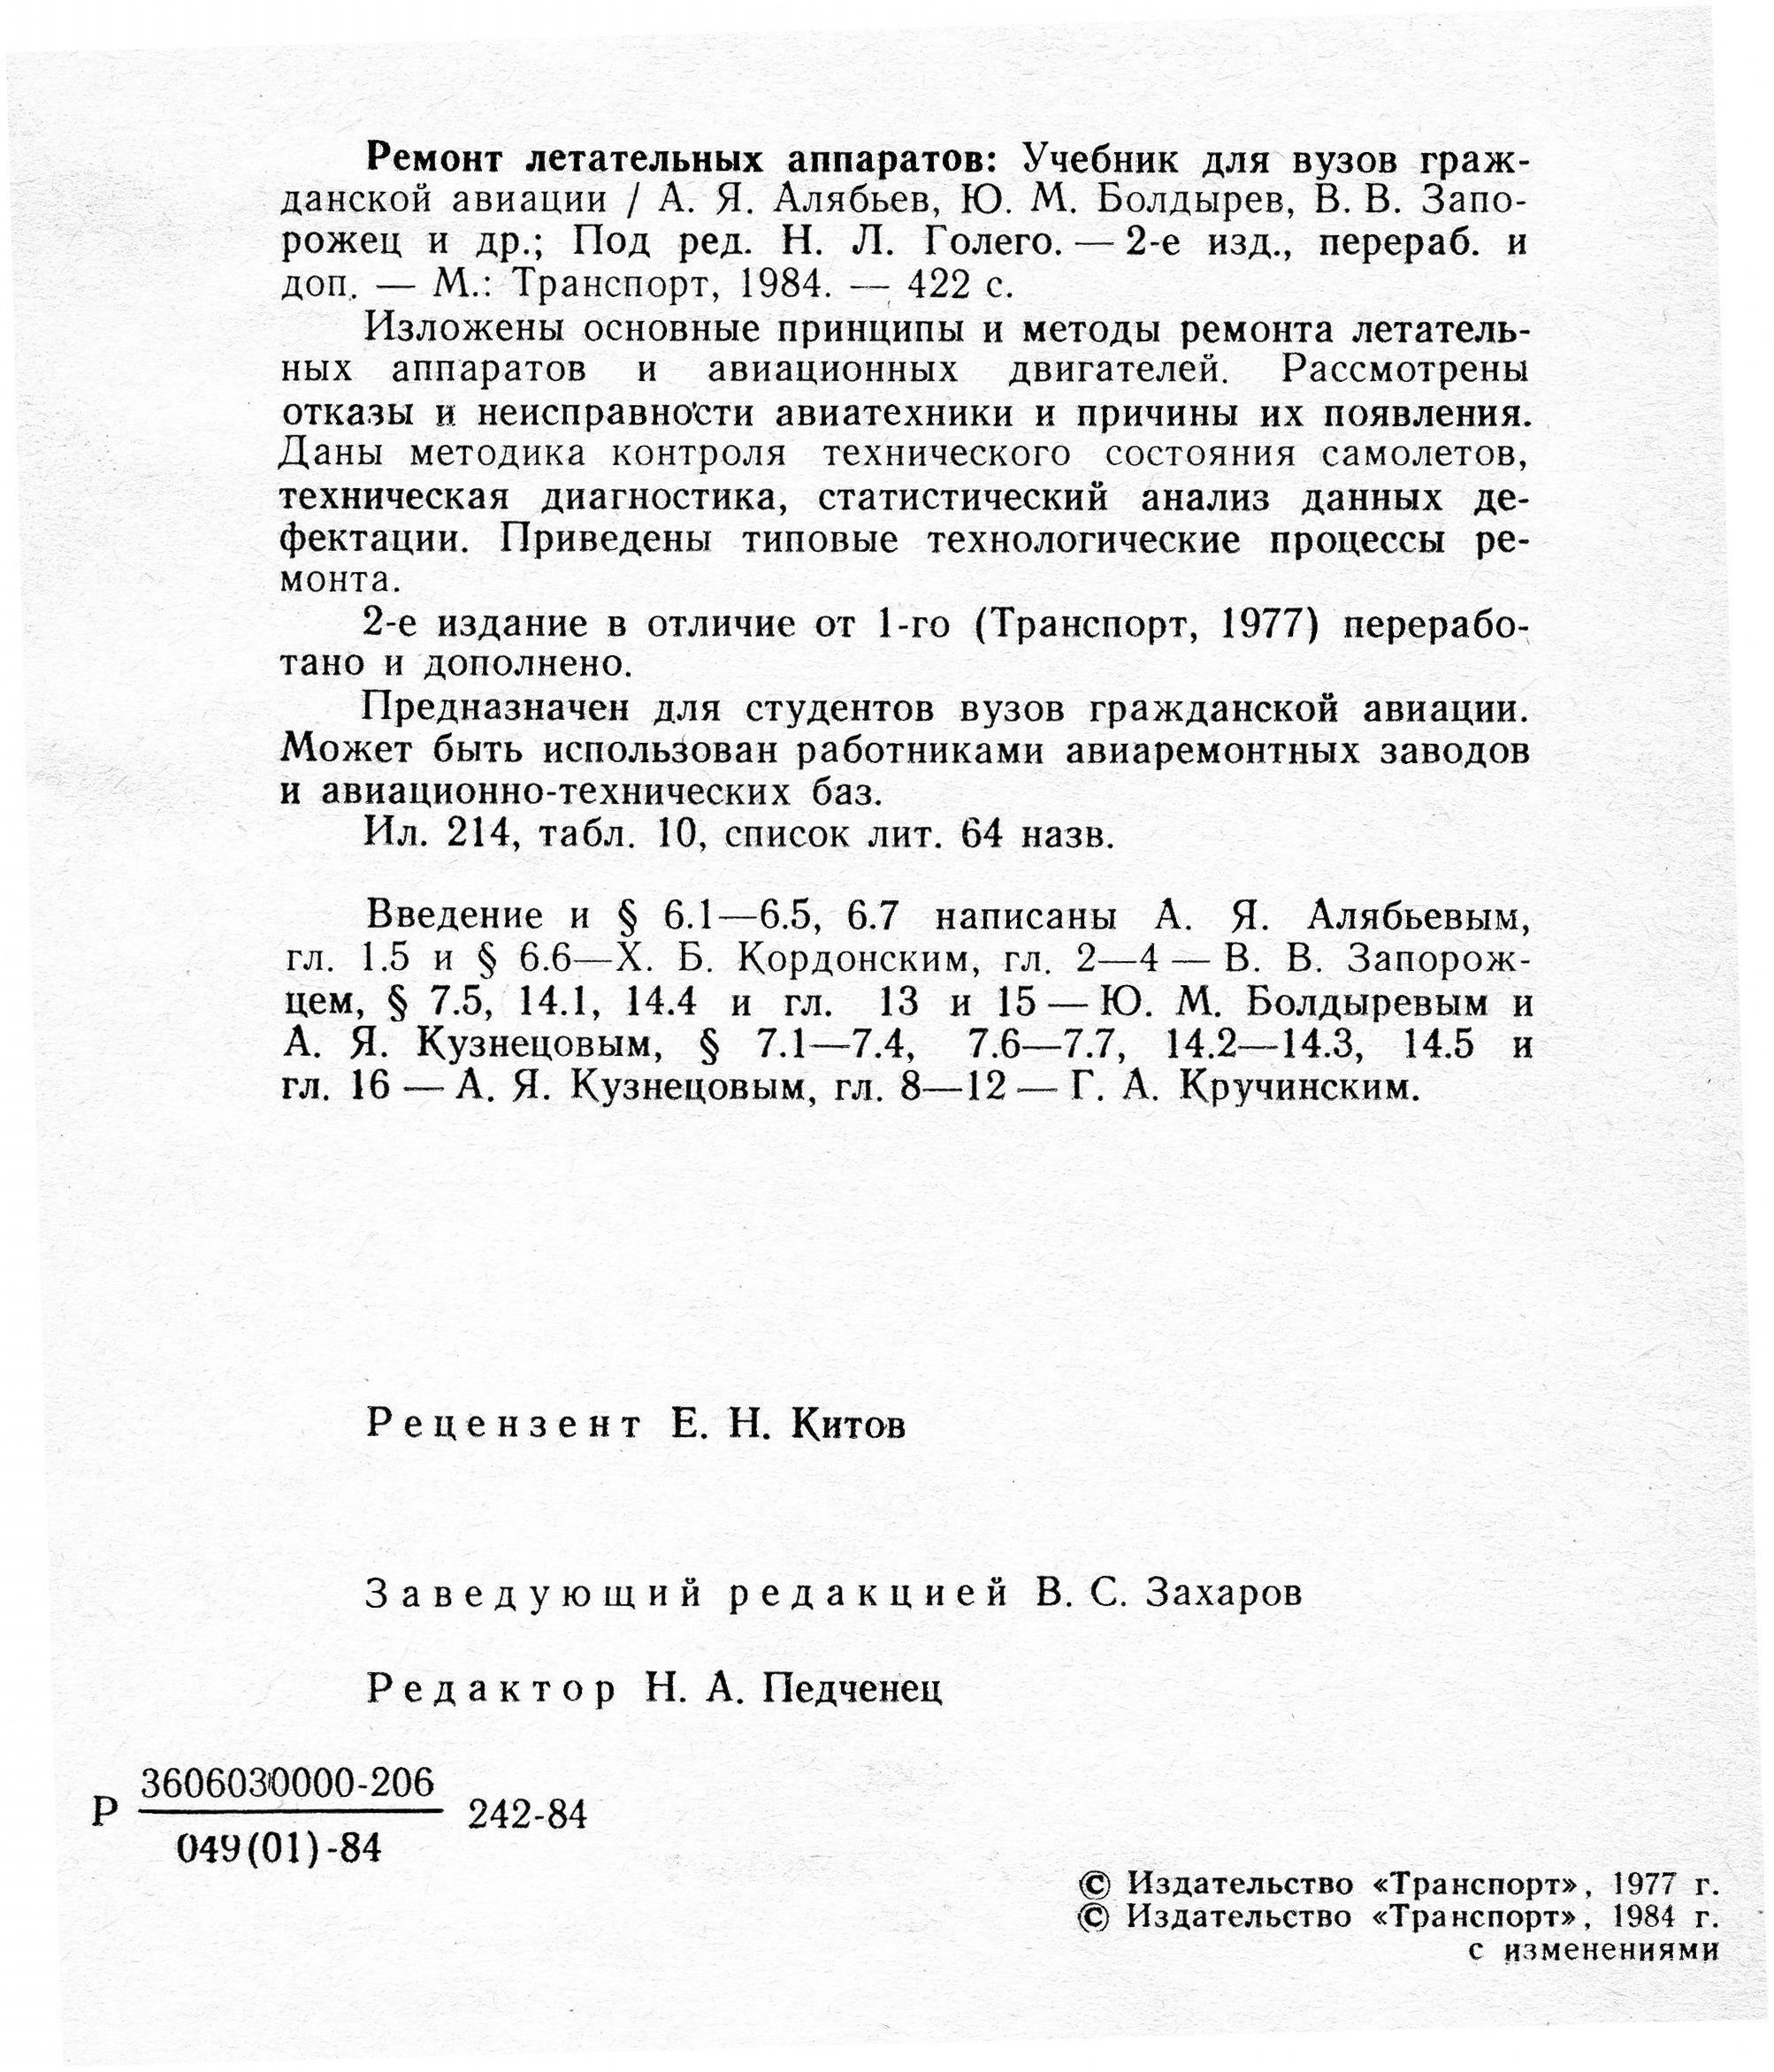 Учебник по ремонту ЛА ГА 1984.jpg